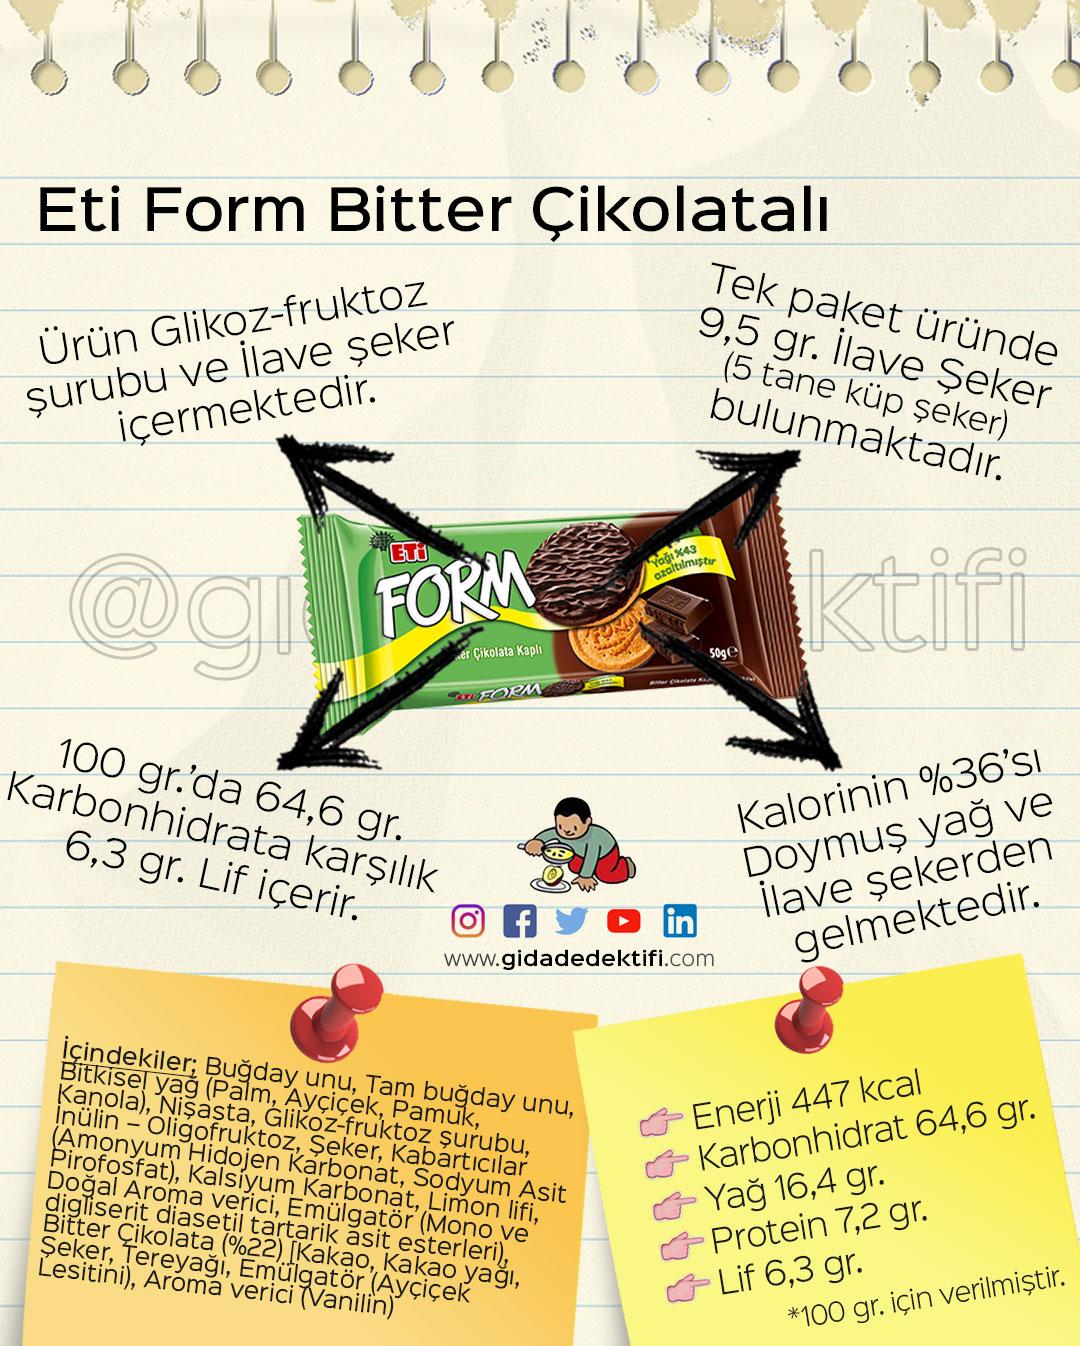 Eti-Form-Bitter